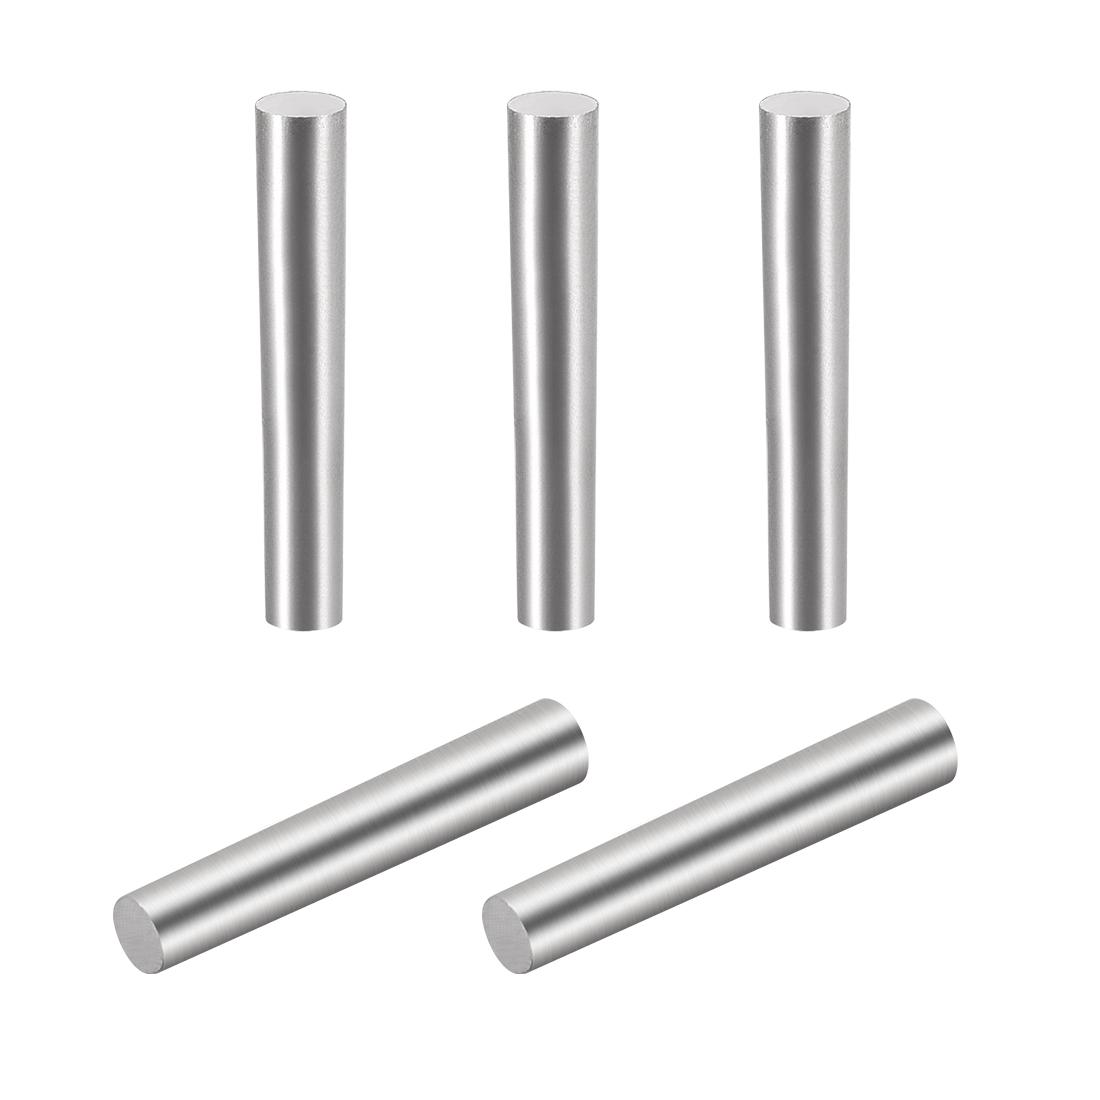 5Pcs 4mm x 30mm 1:50 Taper Pin 304 Stainless Steel Shelf Support Pin Fasten